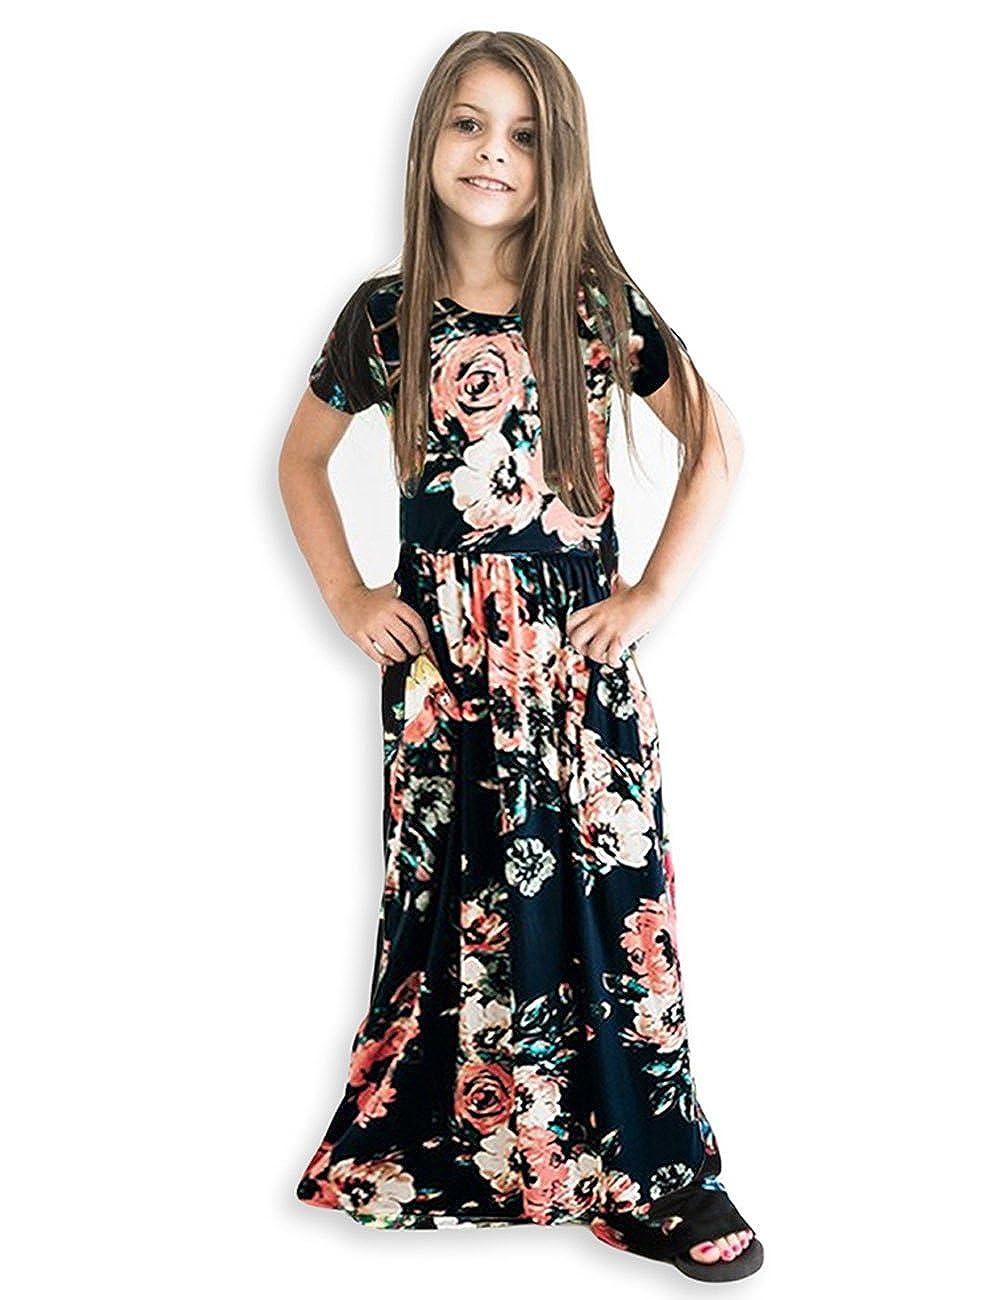 435fb62af Top 10 wholesale Teal Floral Maxi Dress - Chinabrands.com